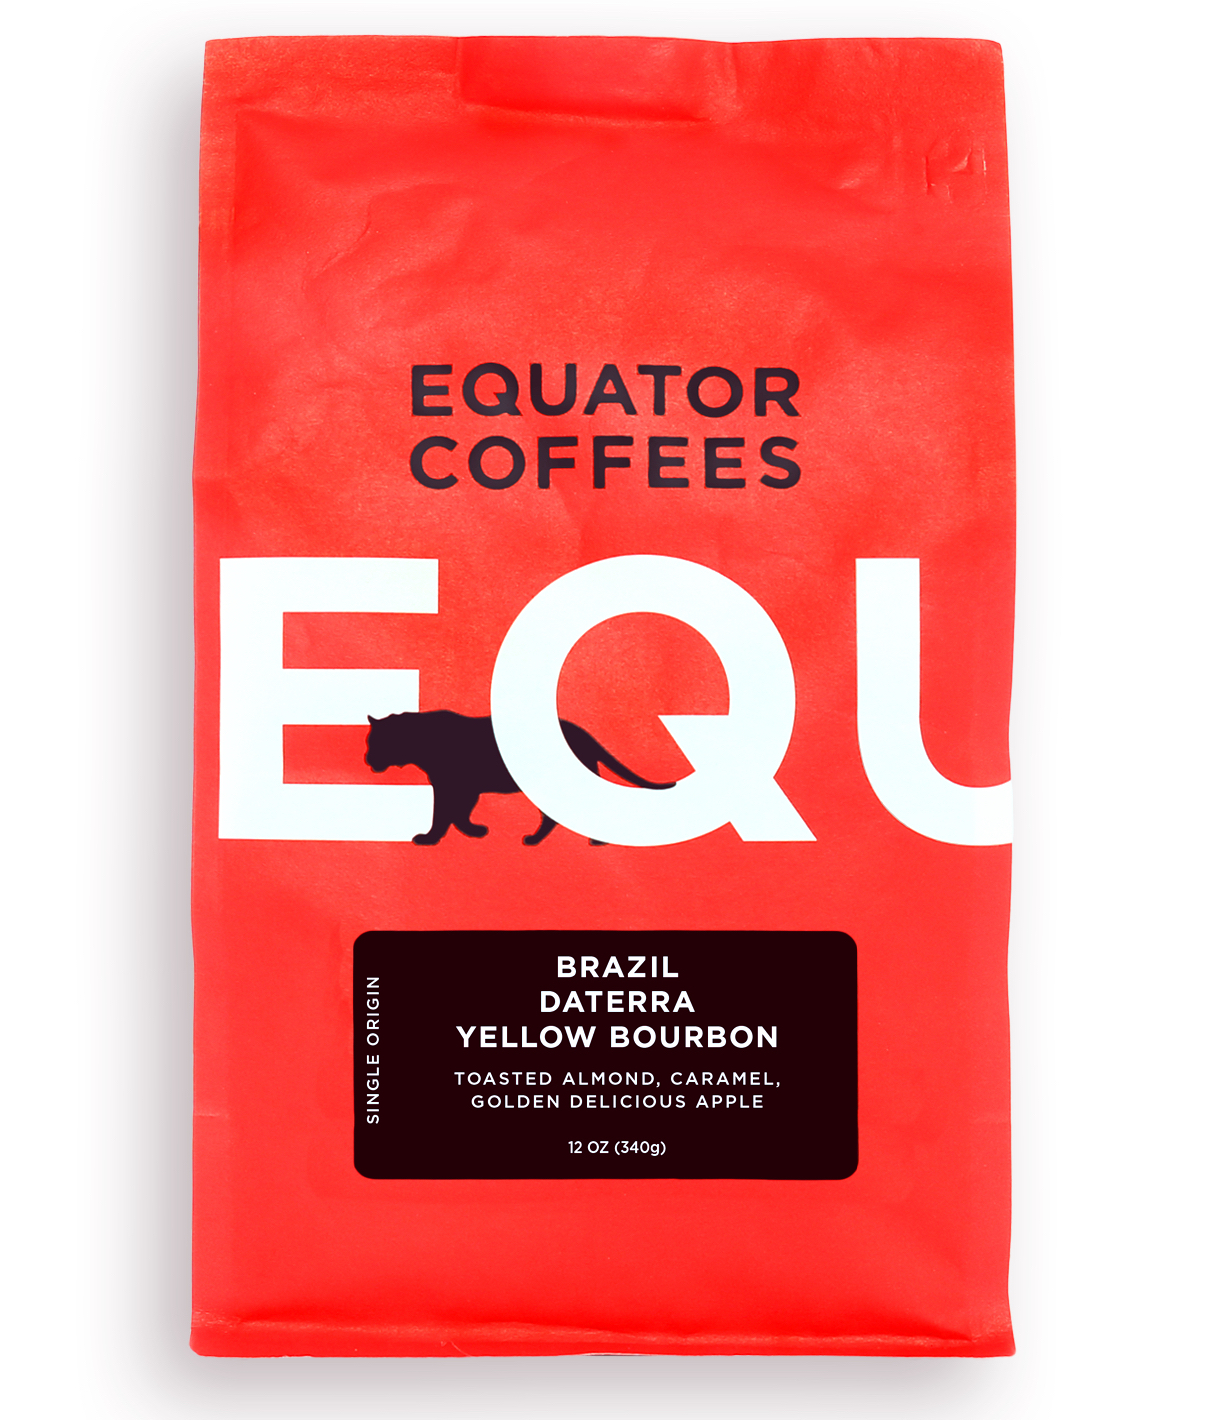 Equator Coffees Brazil Yellow Bourbon Daterra